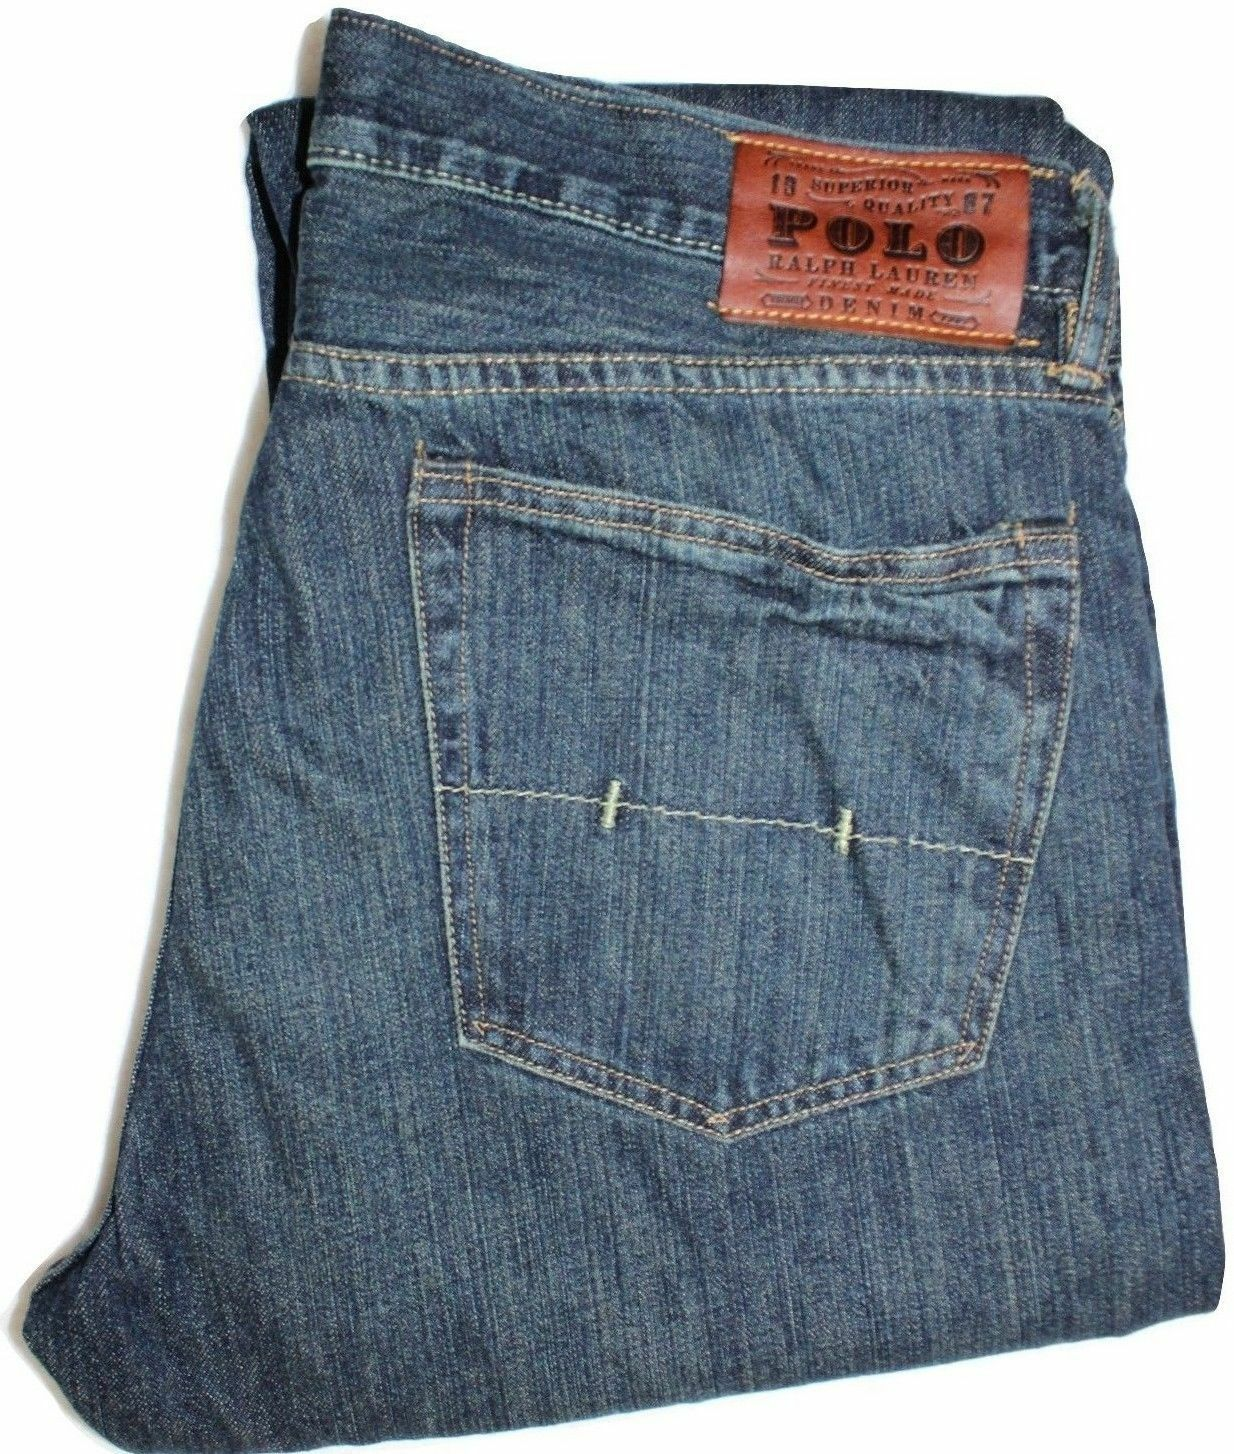 Polo Ralph Lauren Classic 867 Jeans Warren 34X30 NWT